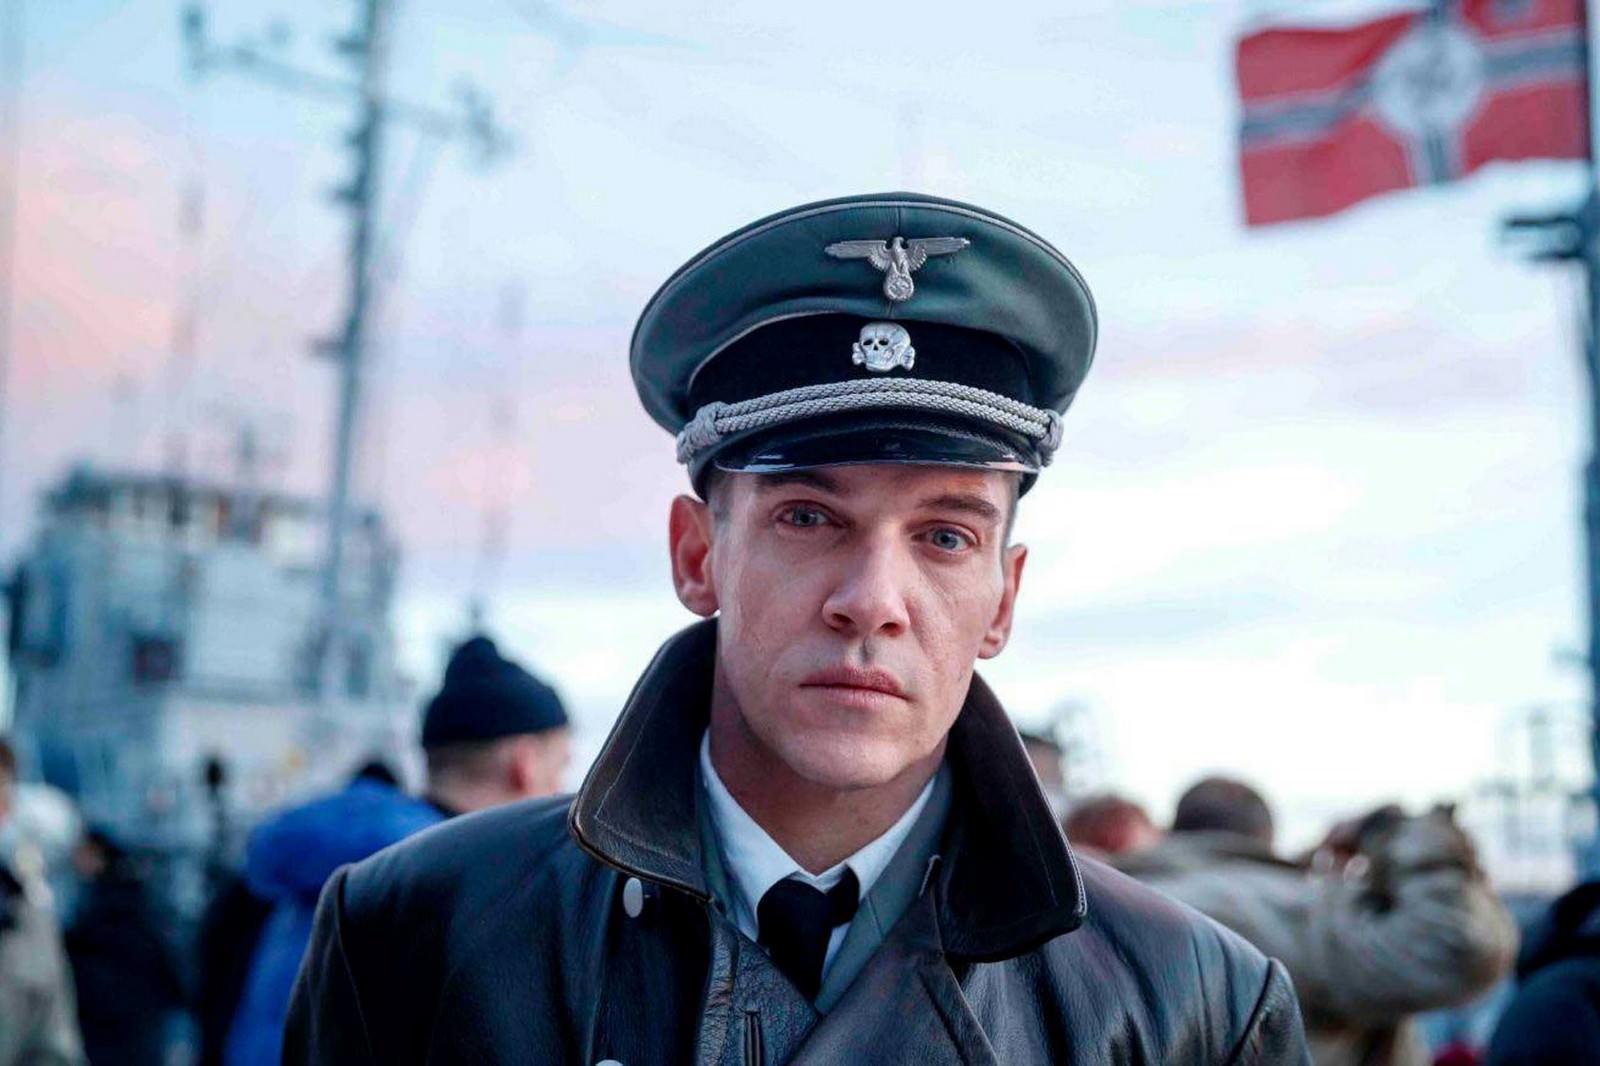 Movie, Den 12. mann(挪威, 2017年) / 不可能的逃亡(台灣) / The 12th Man(英文) / 第十二个人(口語), 電影劇照, 角色與演員介紹